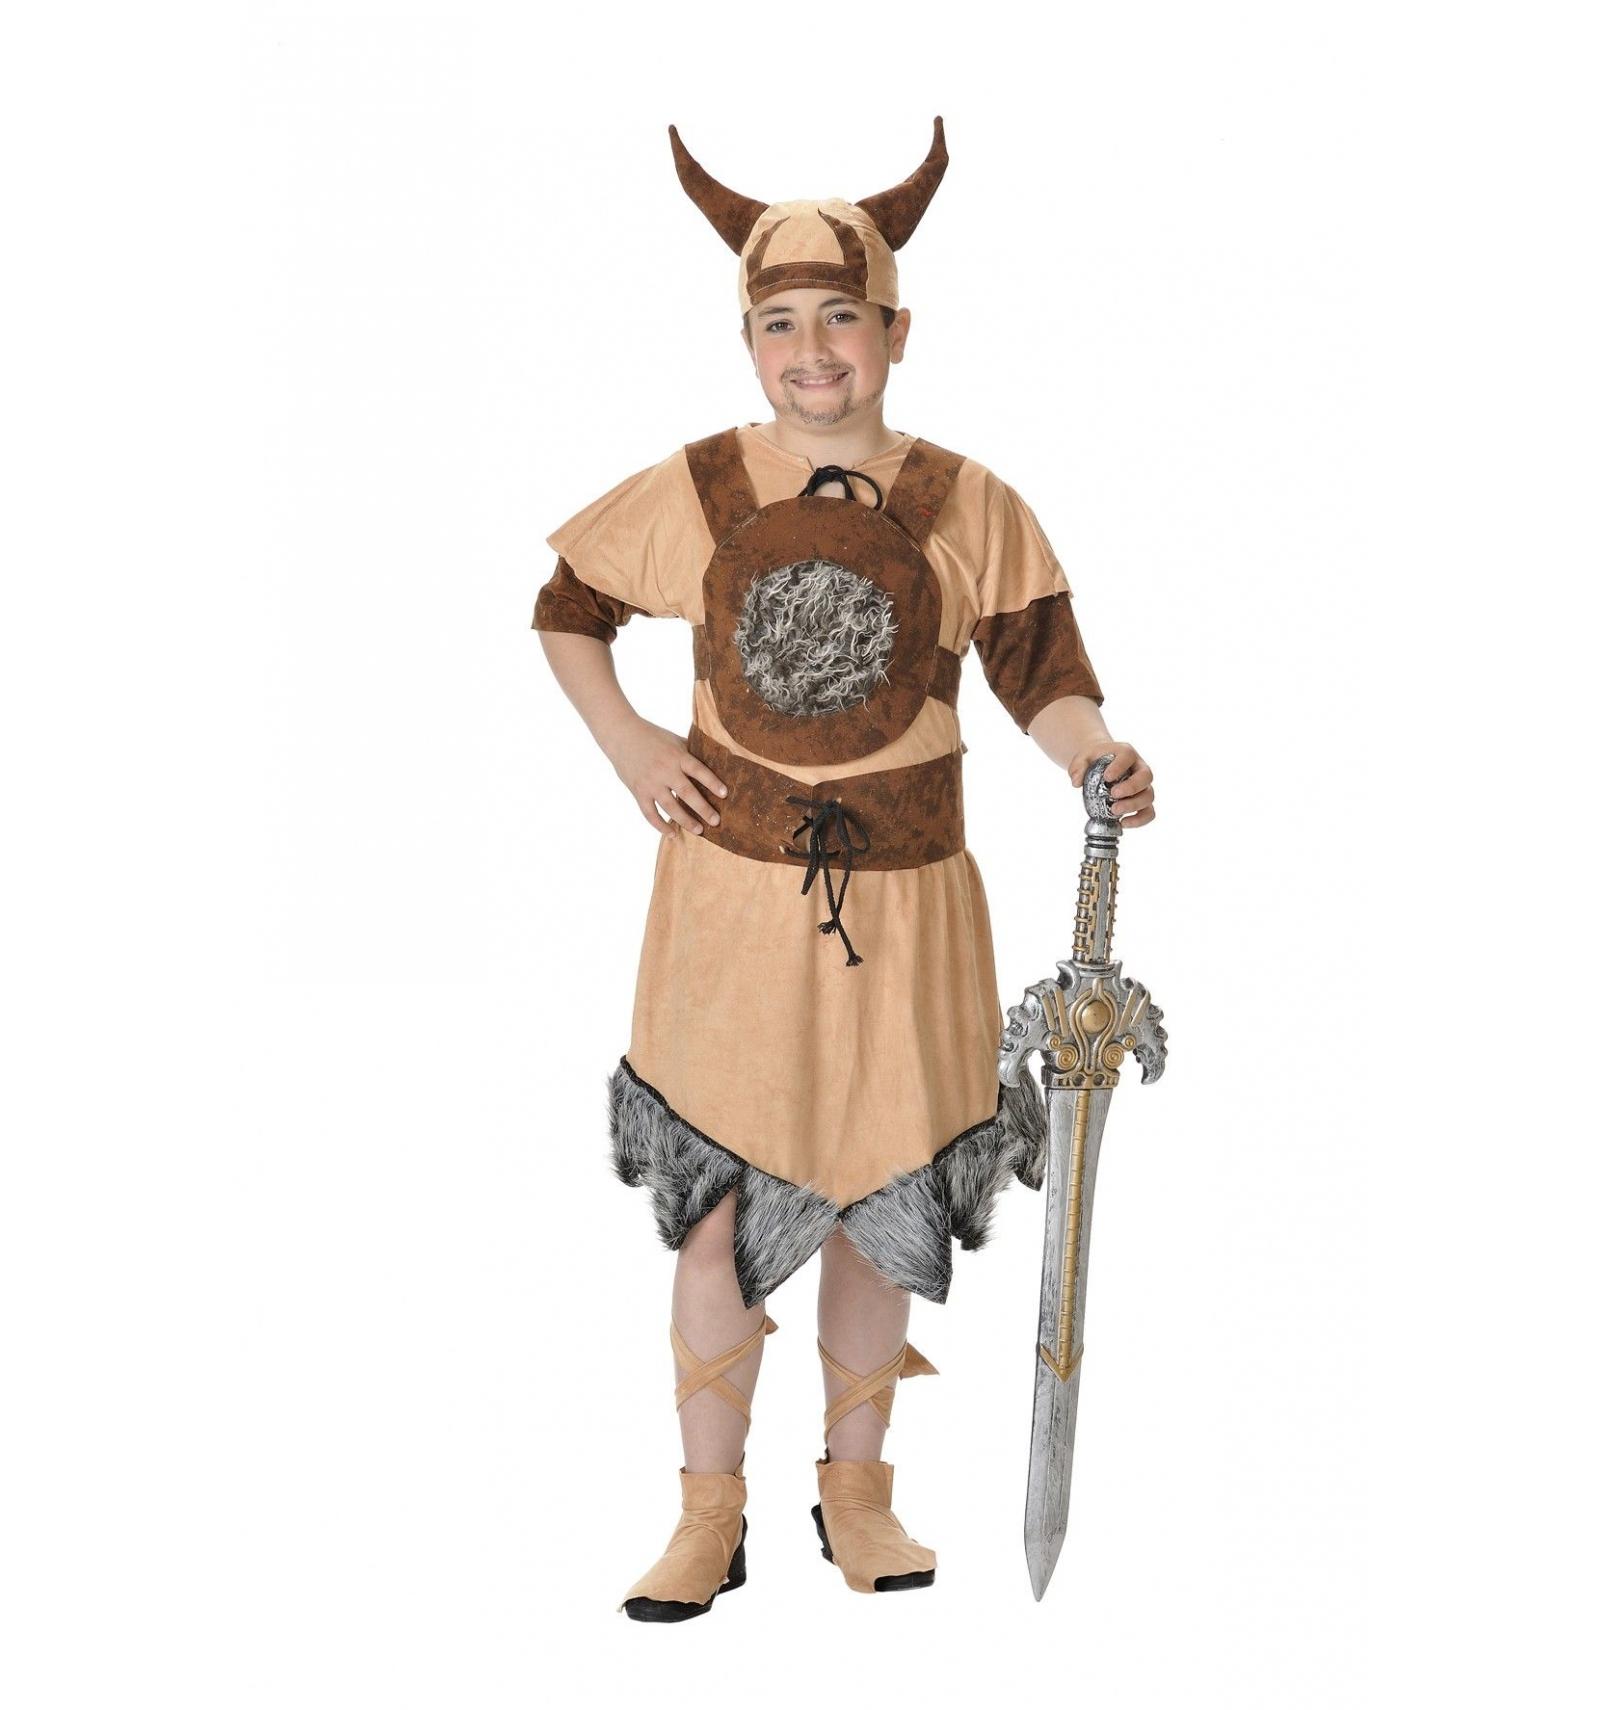 d guisement viking enfant votre magasin de costumes en ligne. Black Bedroom Furniture Sets. Home Design Ideas